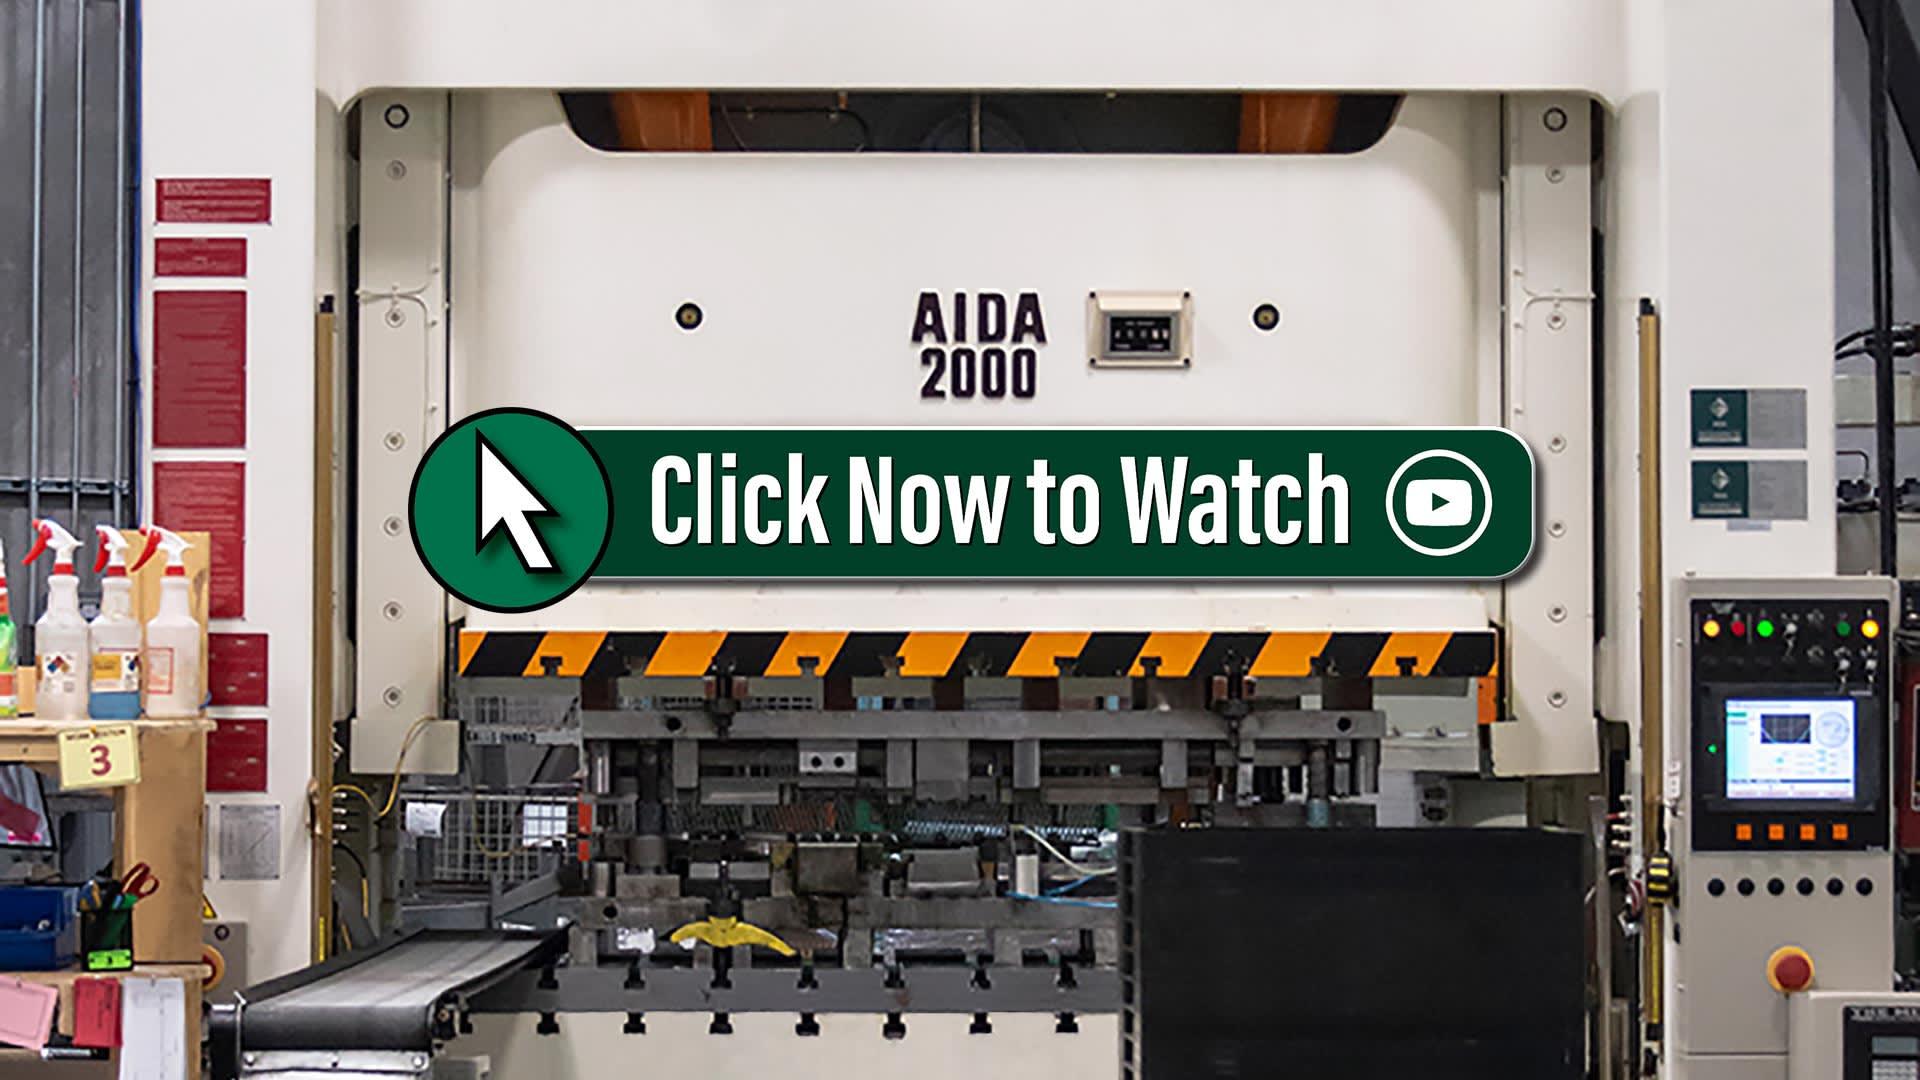 Pinnacle Tool Work's 200 Ton Unitized Frame AIDA Servo Press Video